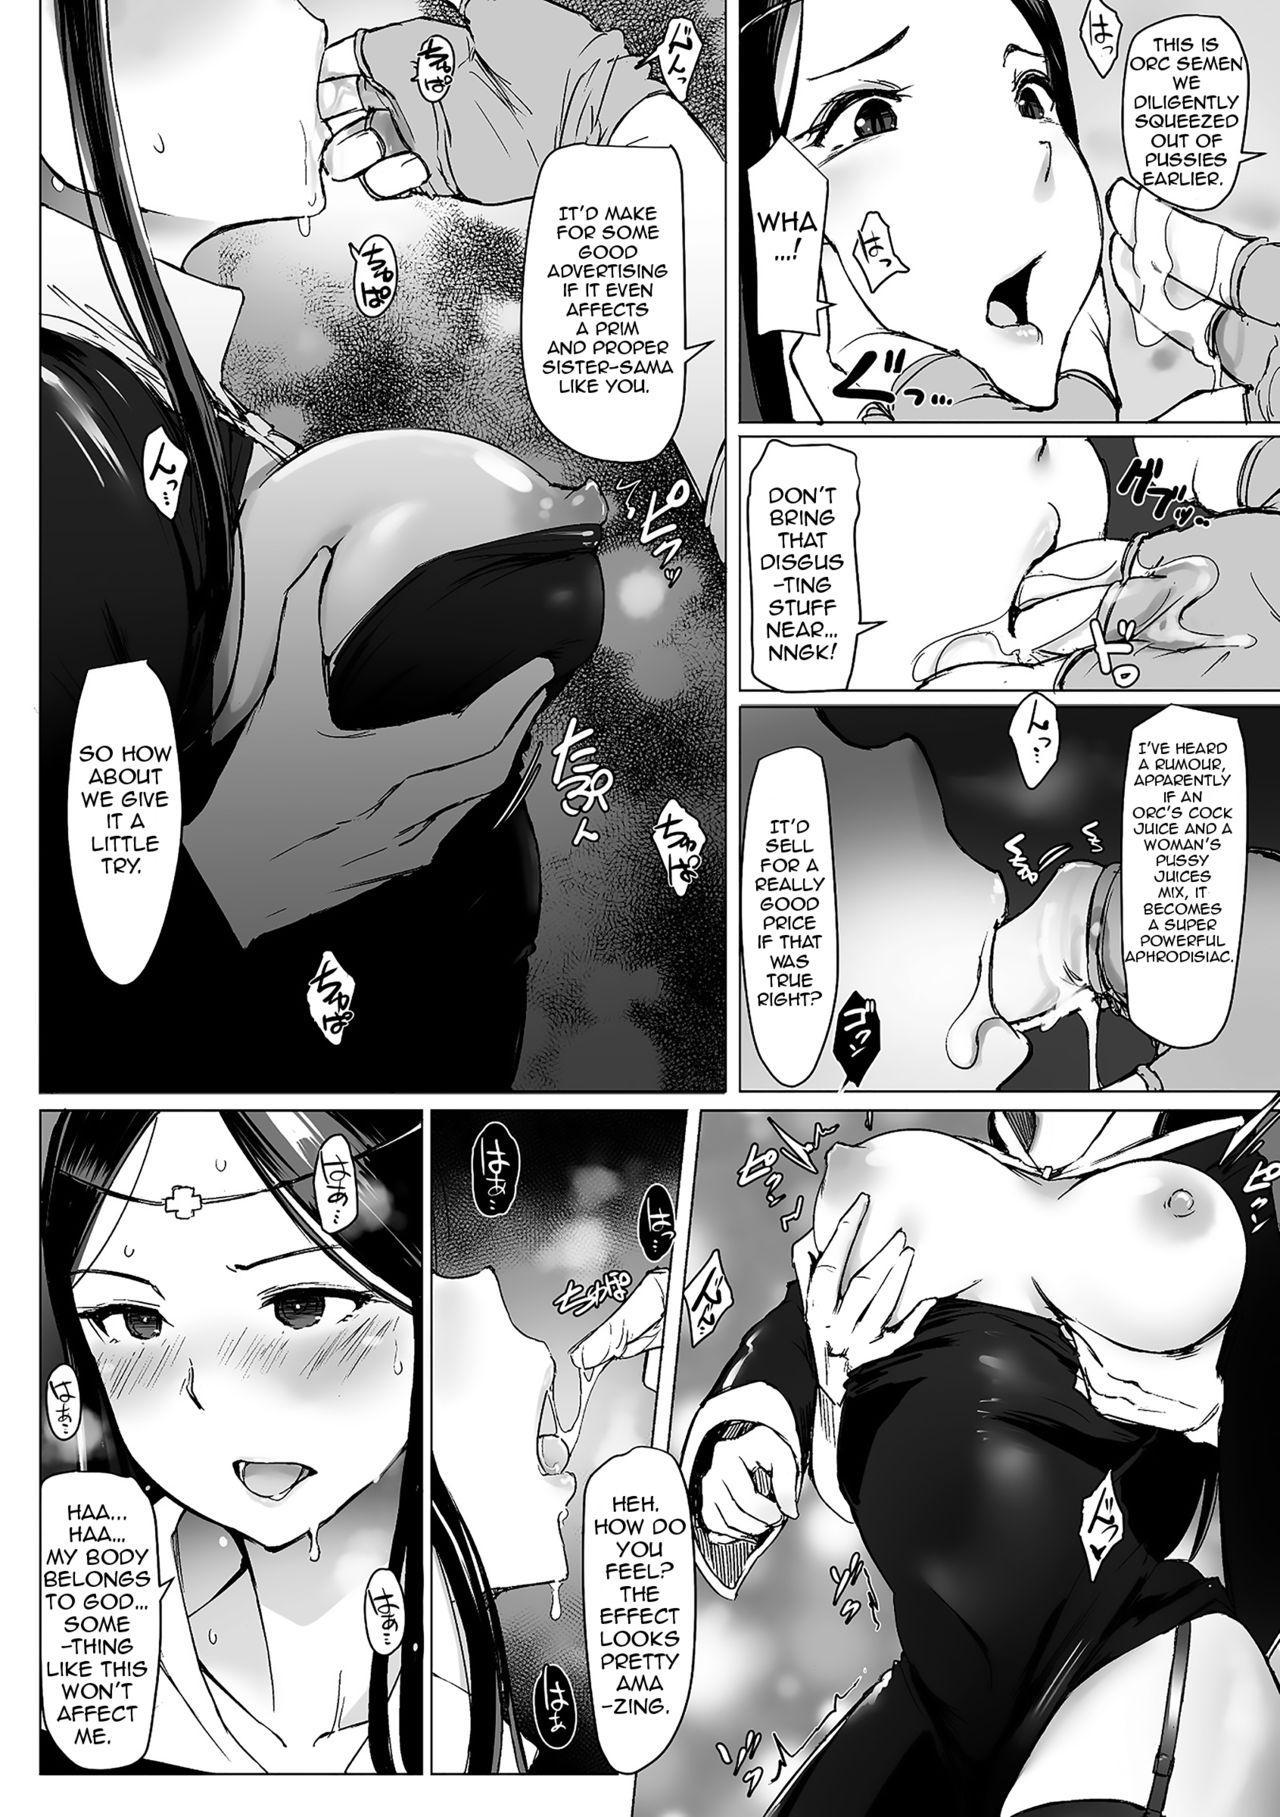 Yamaneko Kishidan Monogatari Onna Kishi Irina Dainiwa | The Tale of the Wildcat Chivalric Order's Knight Irina, Second Story 11